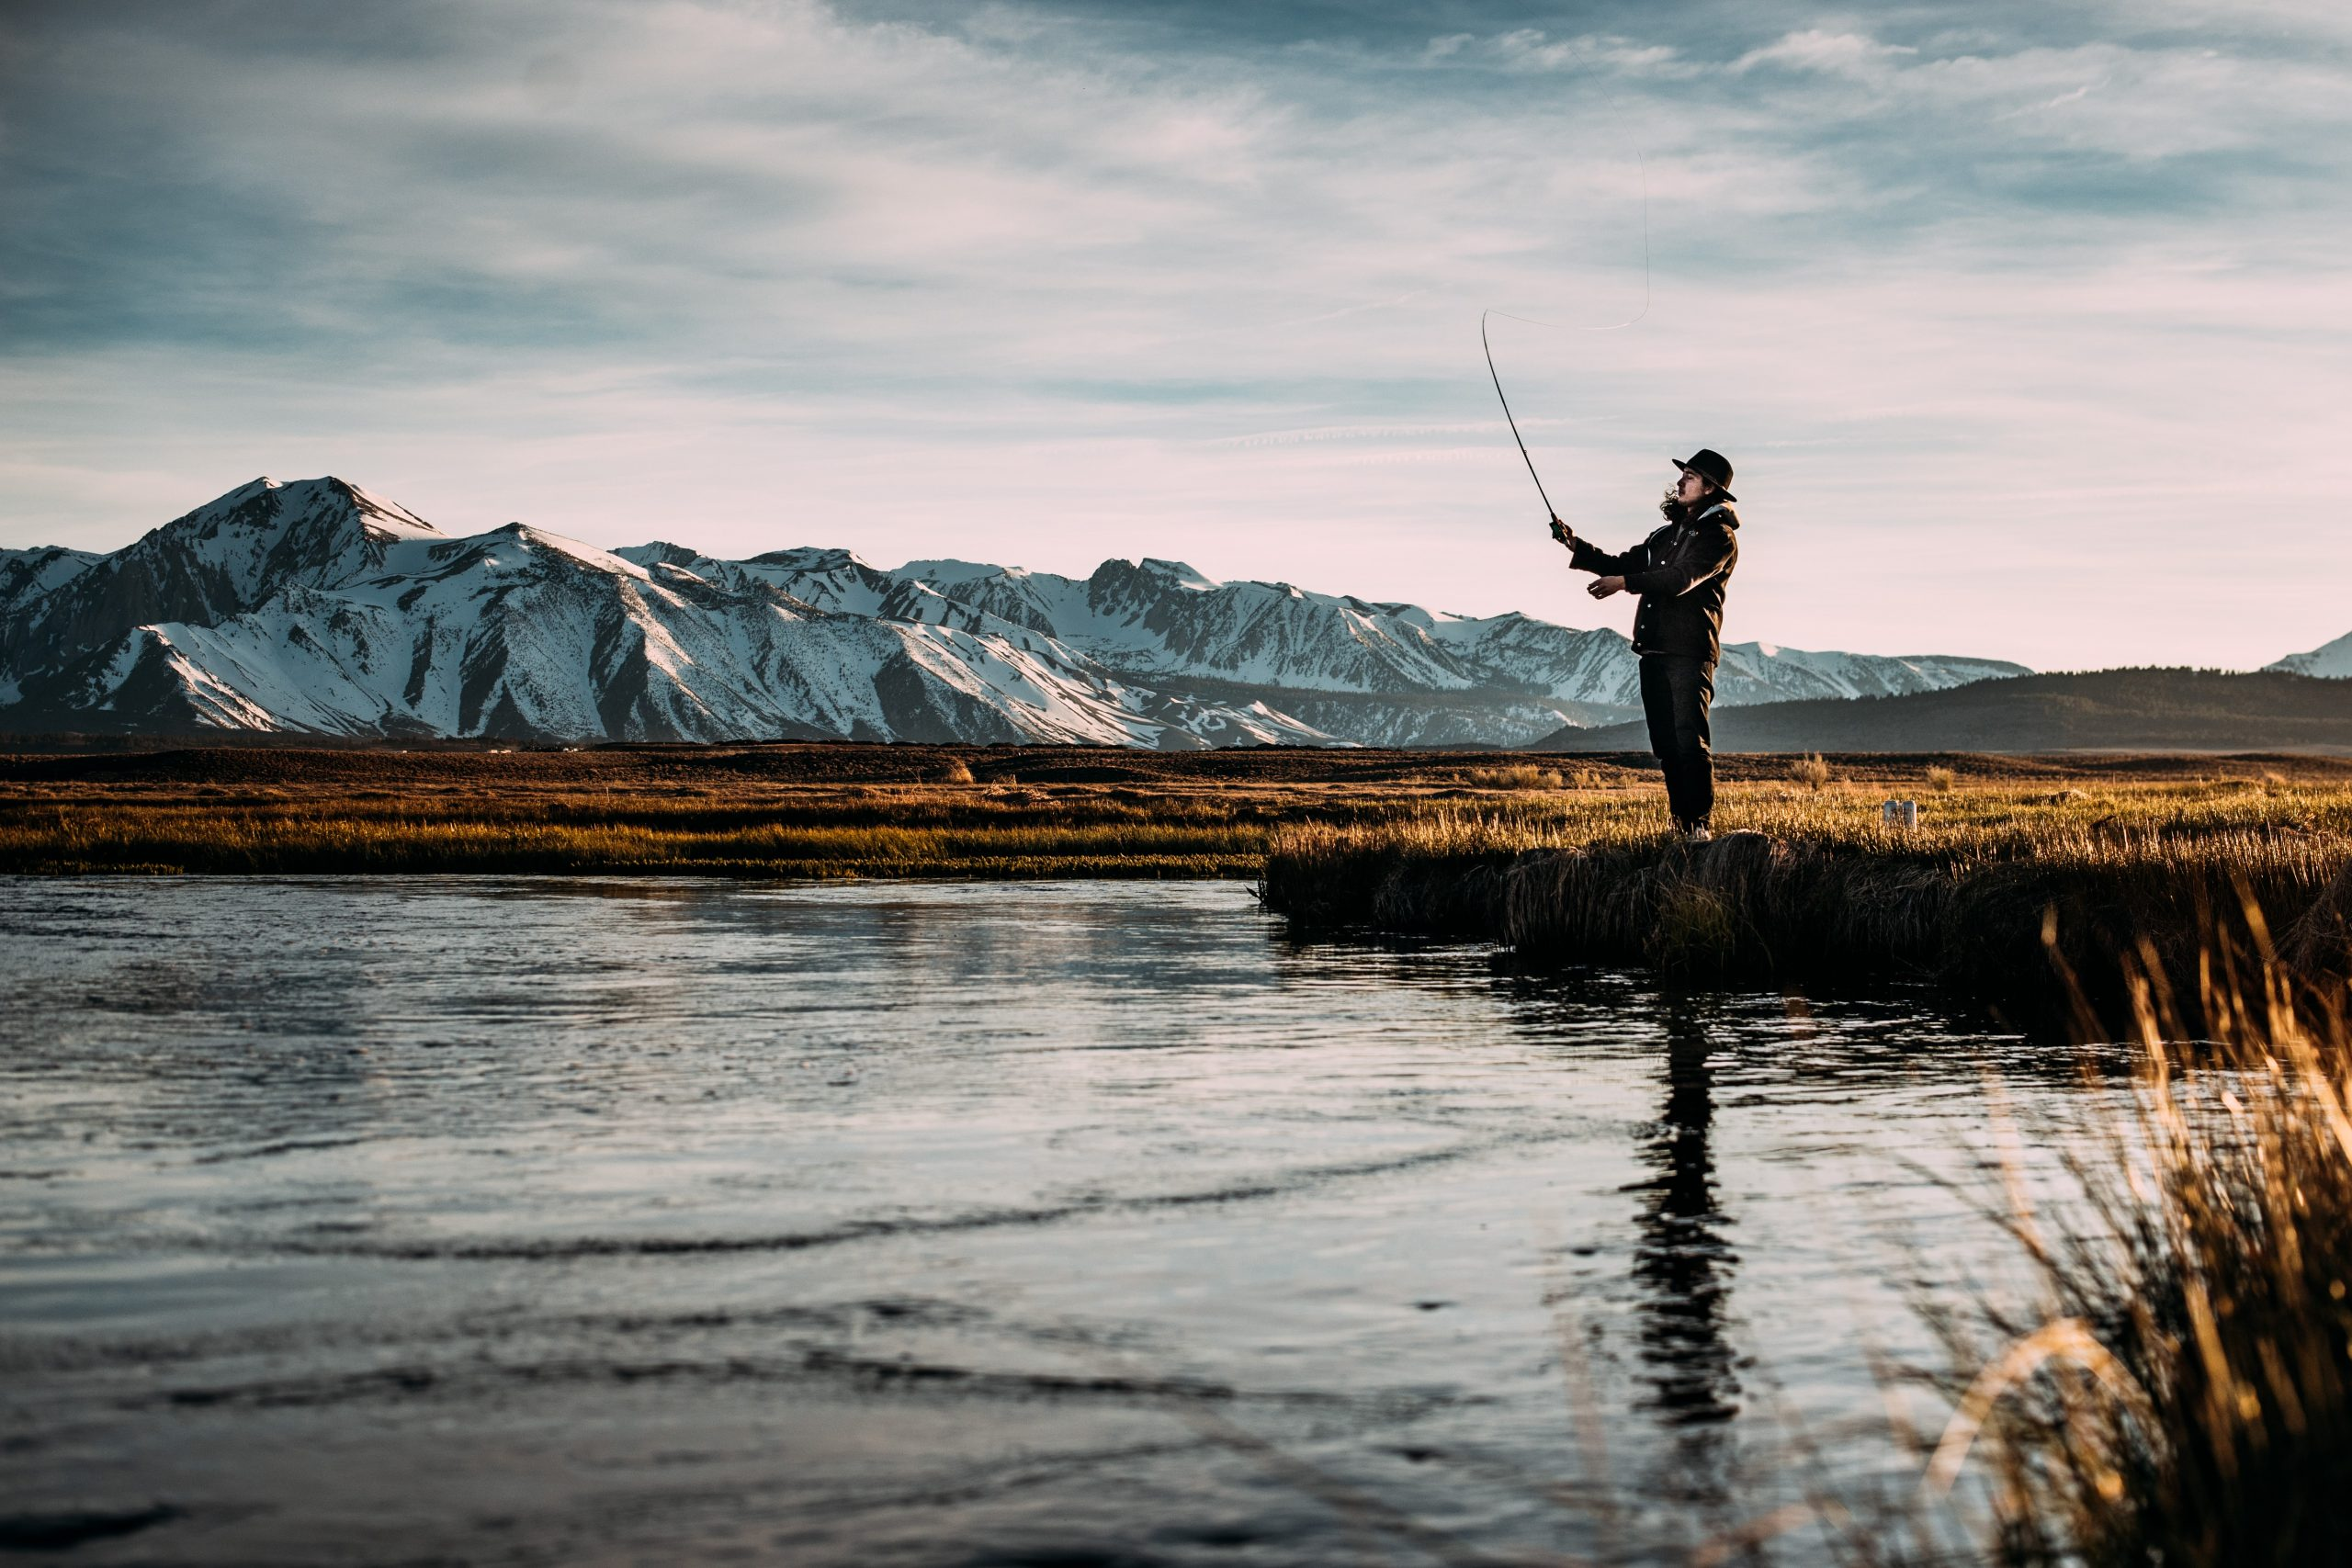 Har du brug for en ny fiskestang?